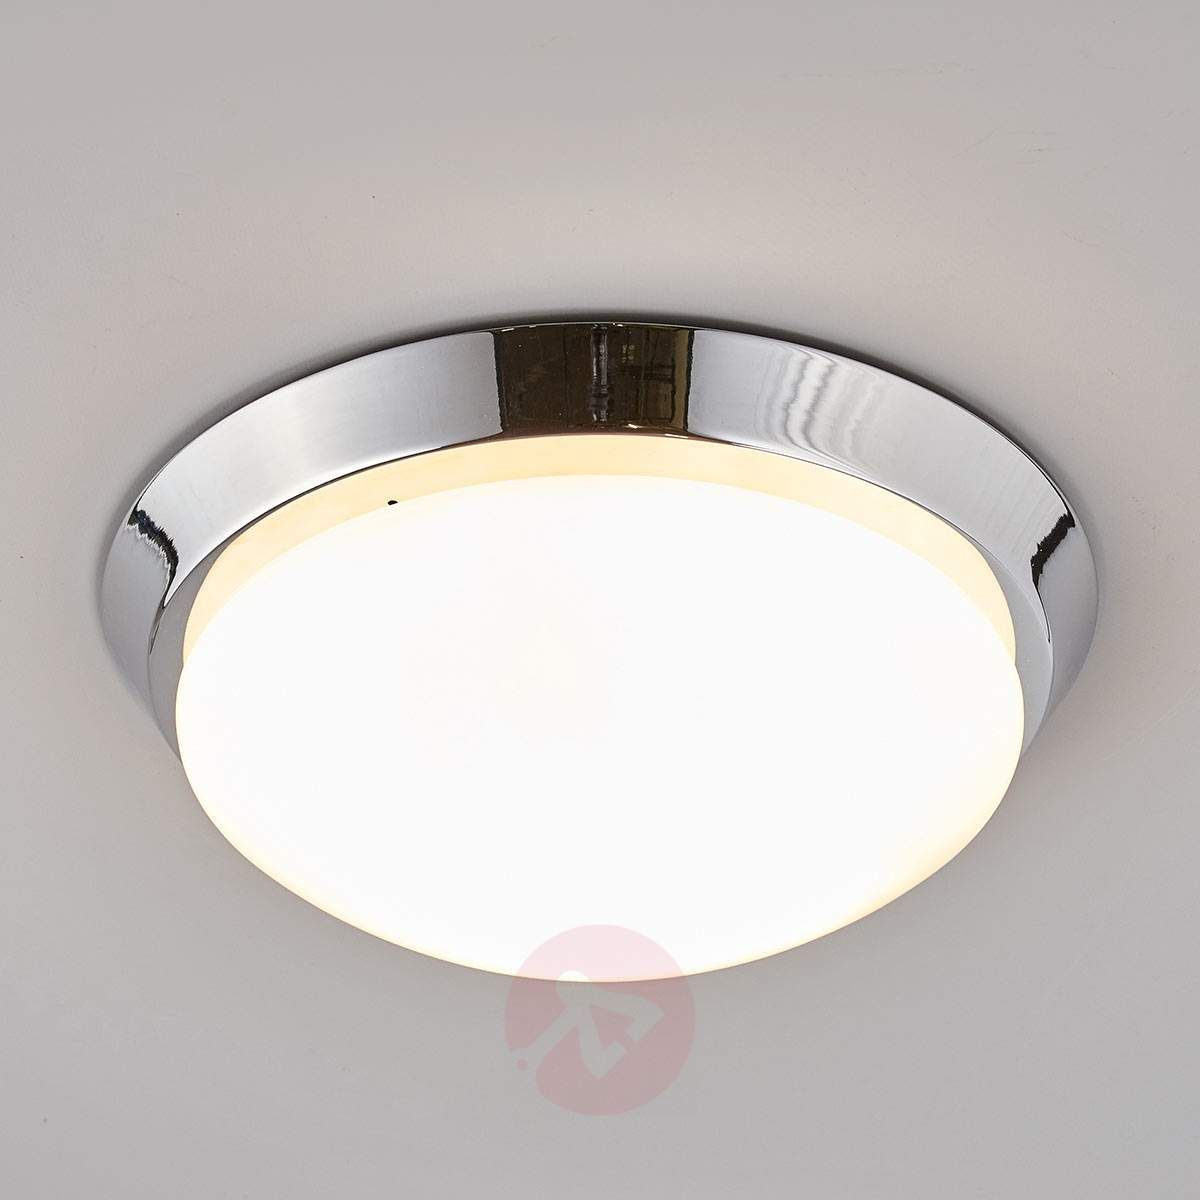 Okragla Lampa Sufitowa Dilani Do Lazienki Lampa Sufitowa Lampy